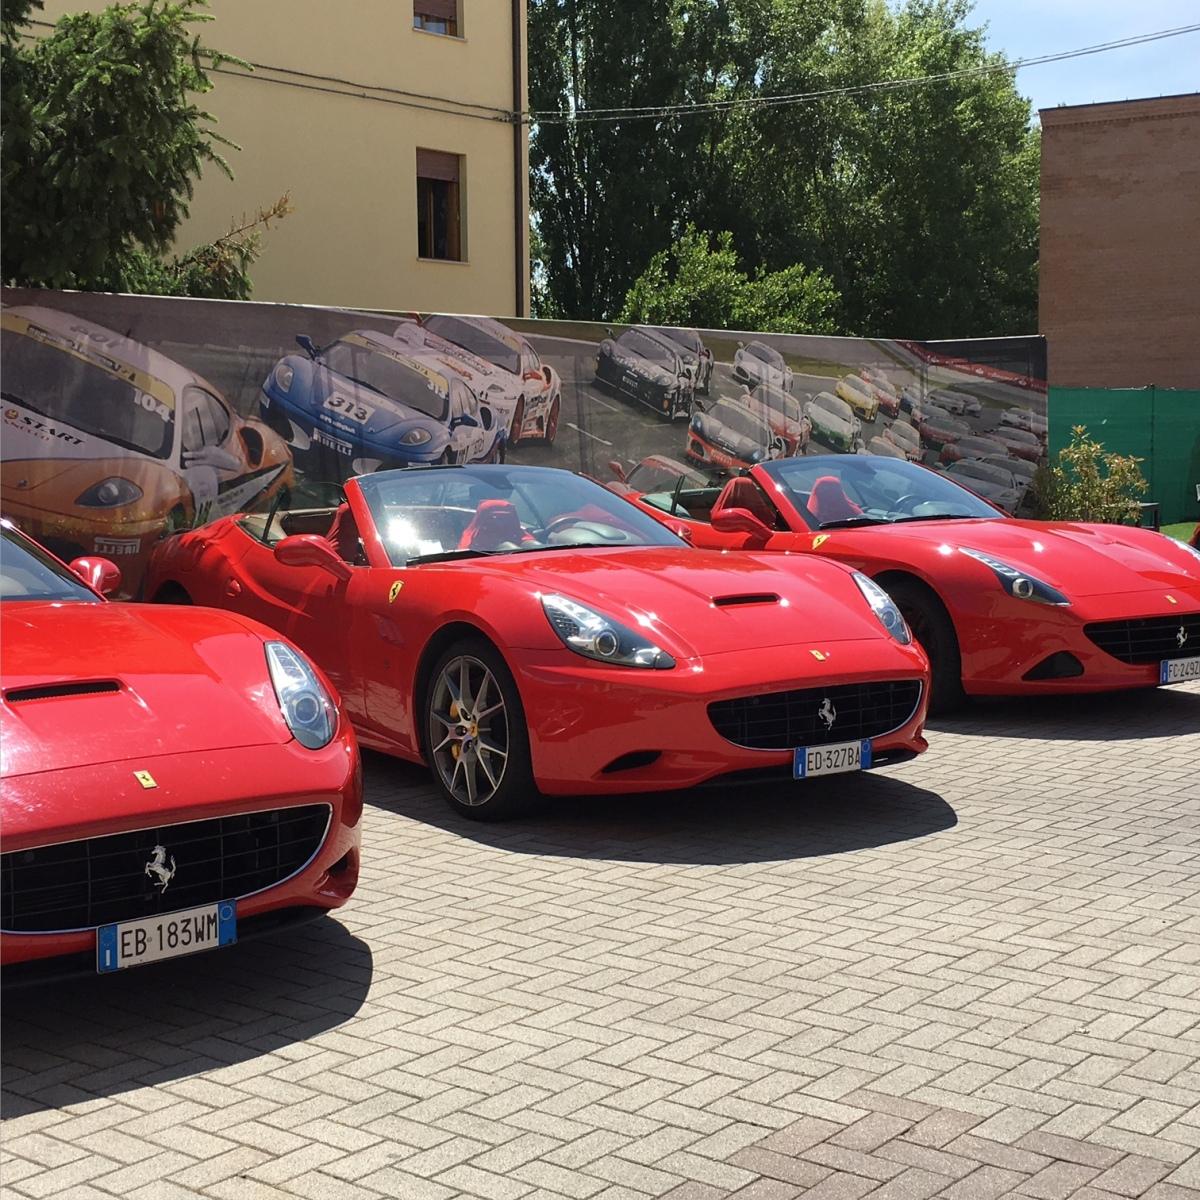 Ferrari Italy: Maranello, Emilia Romagna, Italy